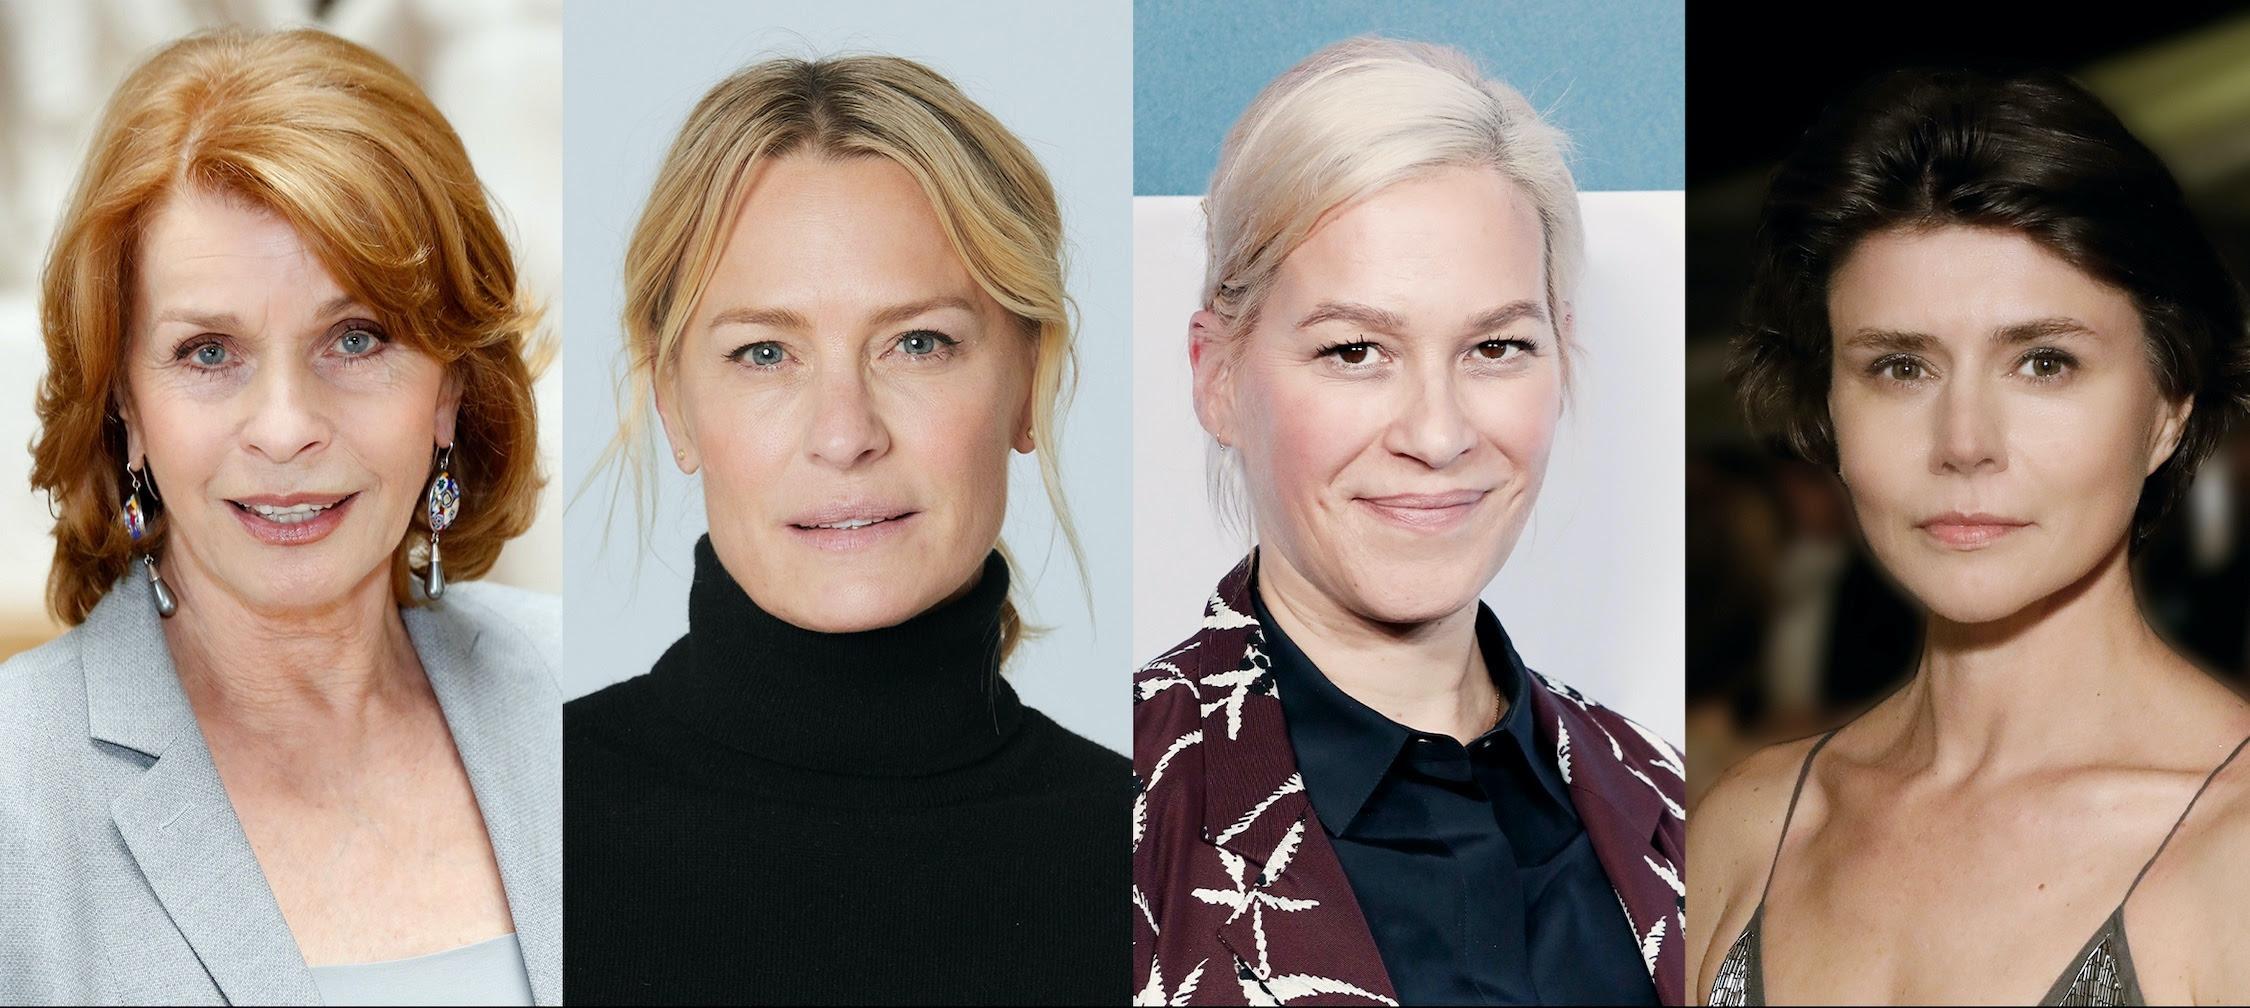 Senta Berger, Robin Wright, Franka Potente, Małgorzata Szumowska honored at Filmfest München